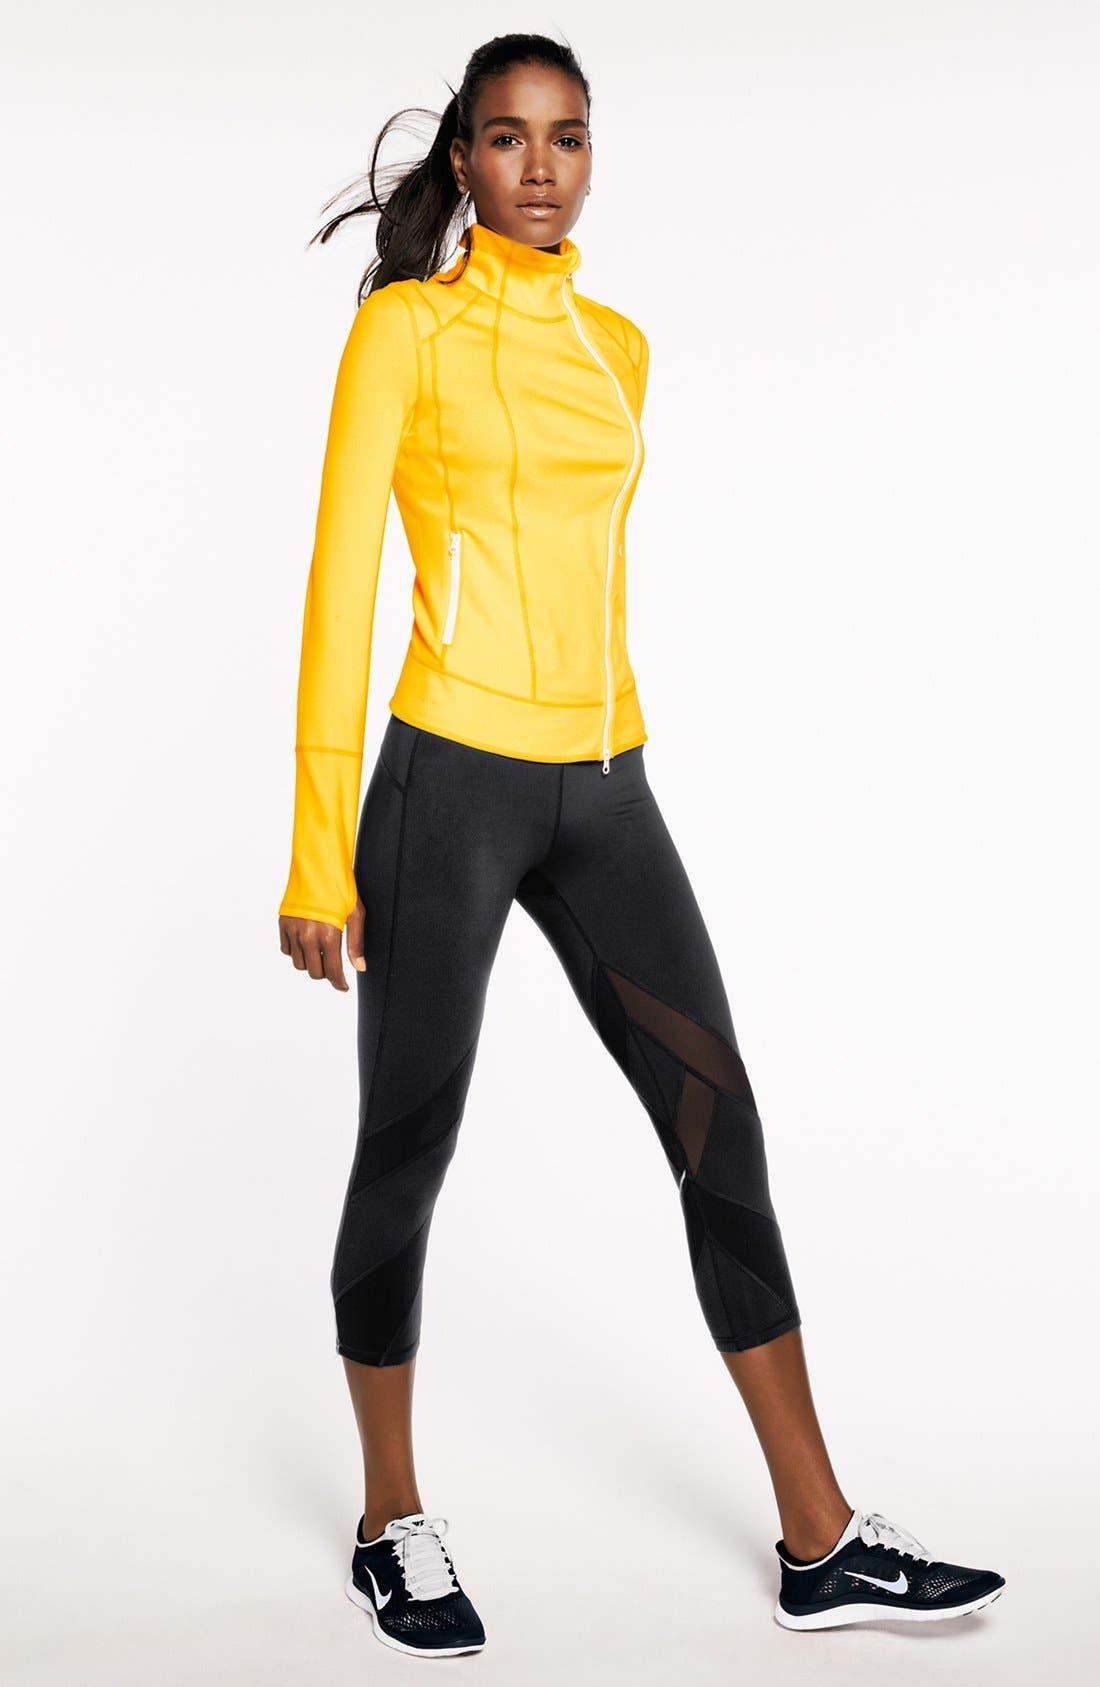 Main Image - Zella Jacket & Crop Pants